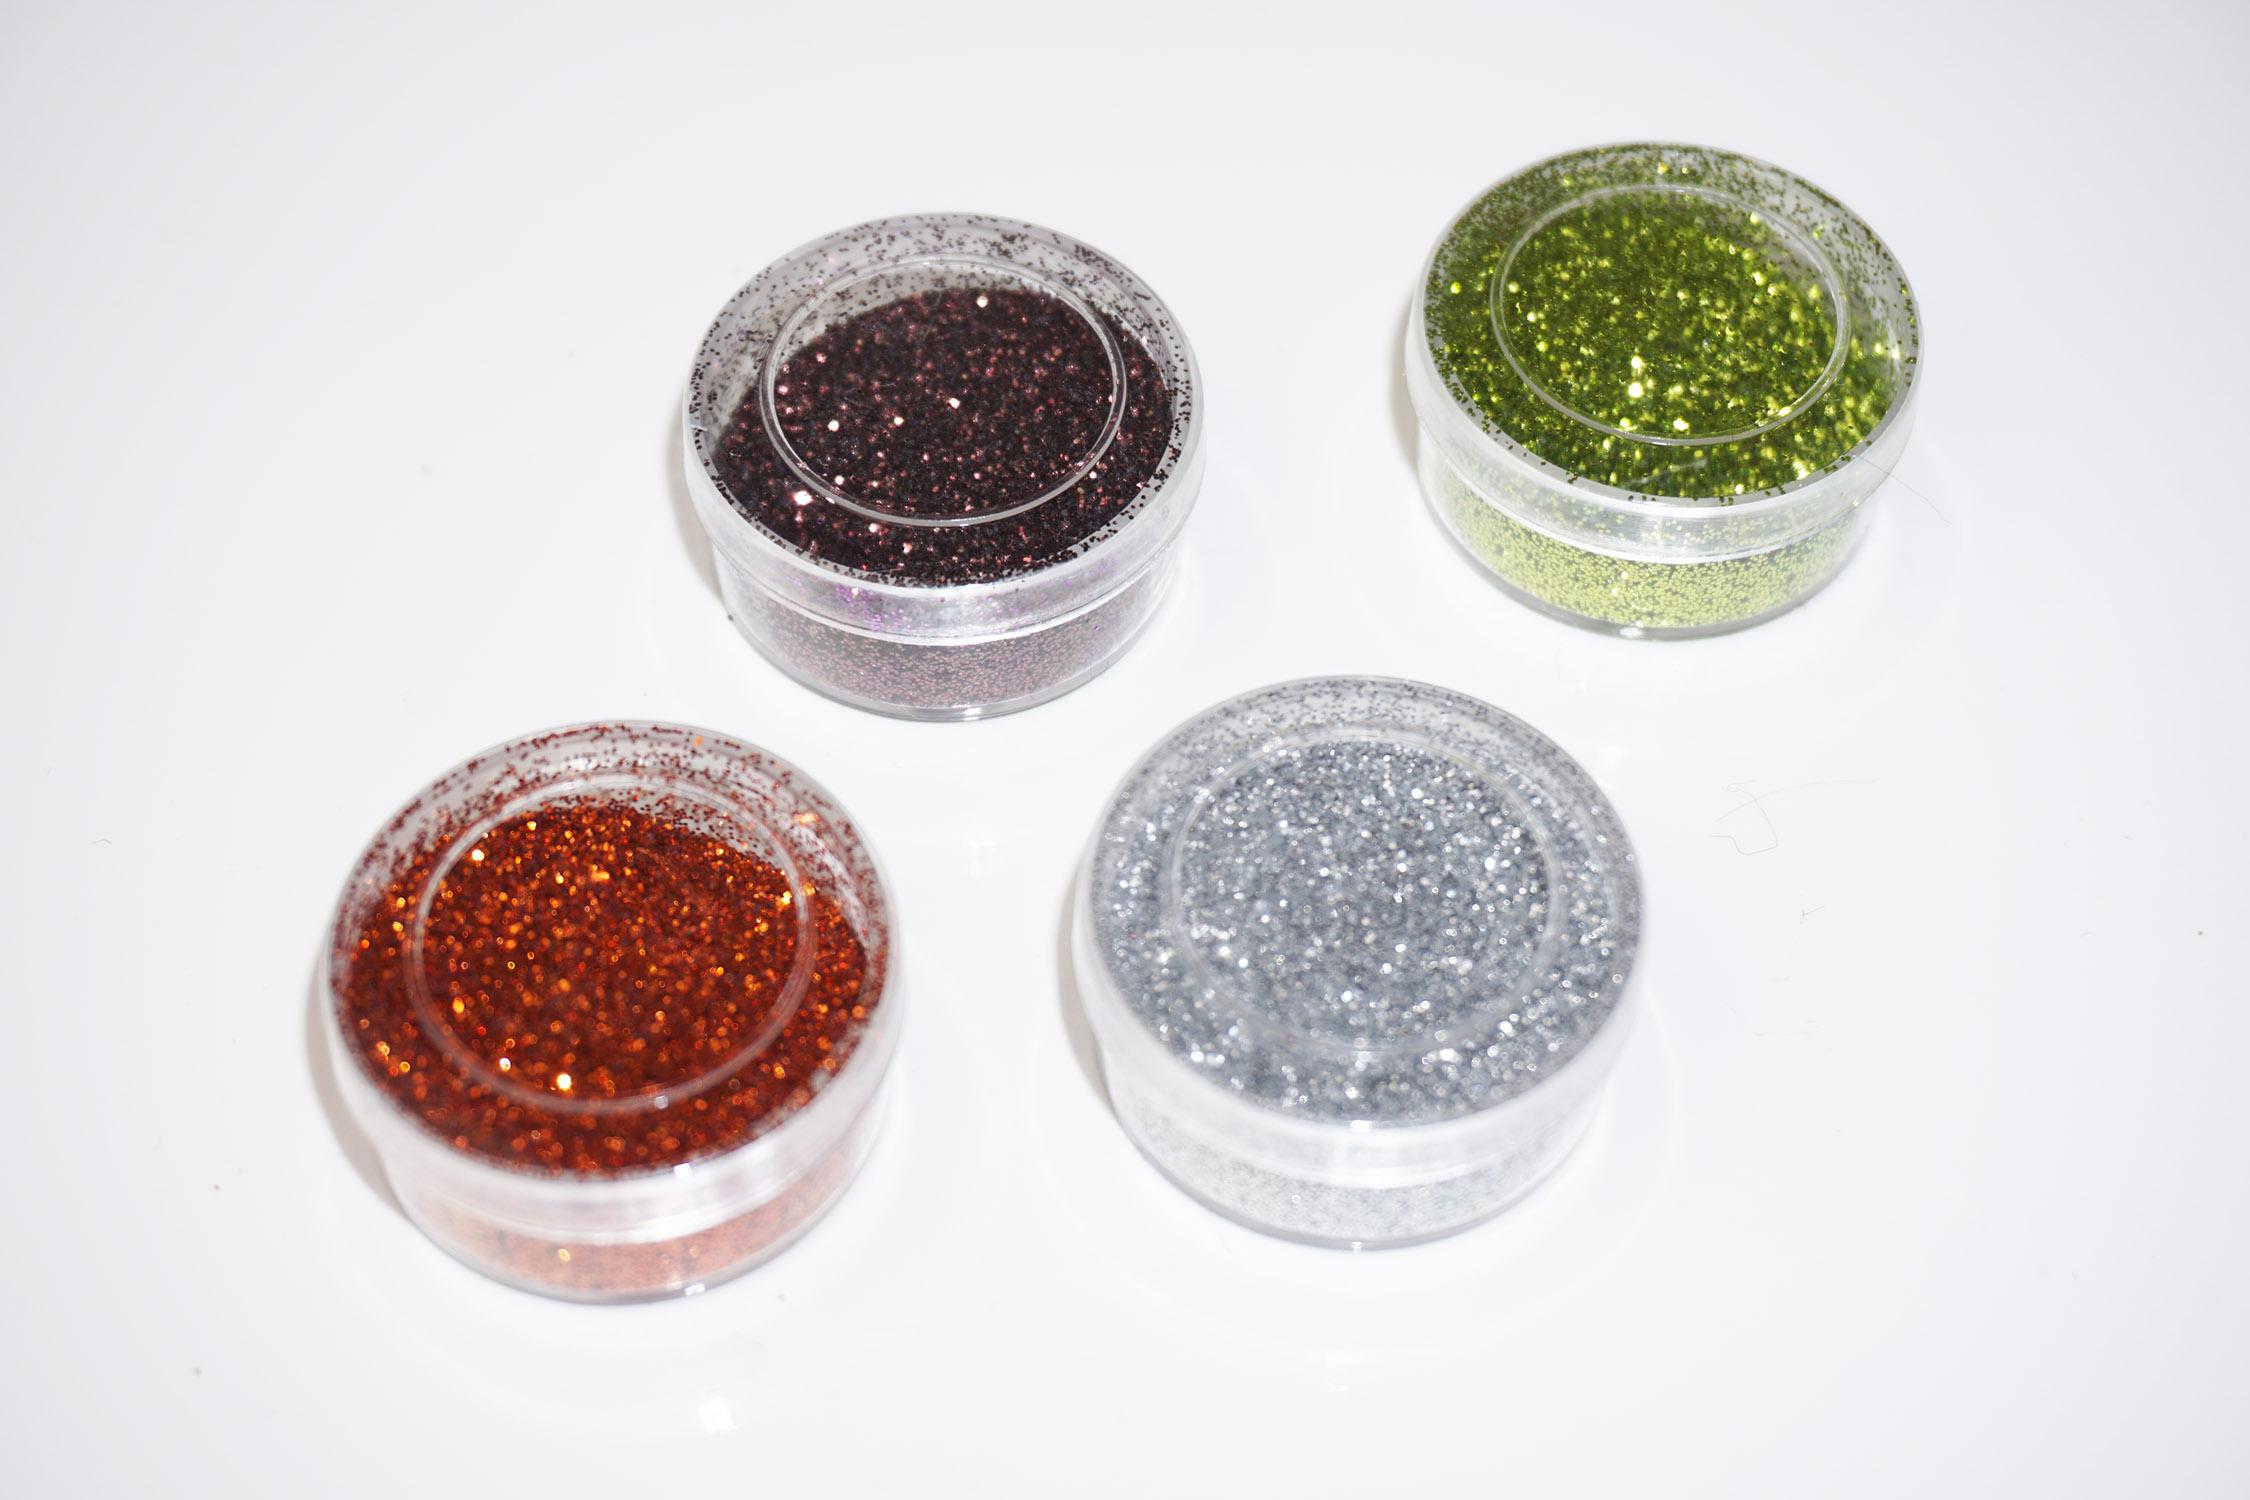 Glitzer Glitzerpulver Glitzer-Staub Glitter Glitzer Tattoo´s Nail Set 4 Farben Herbst Grün Kupfer 6g